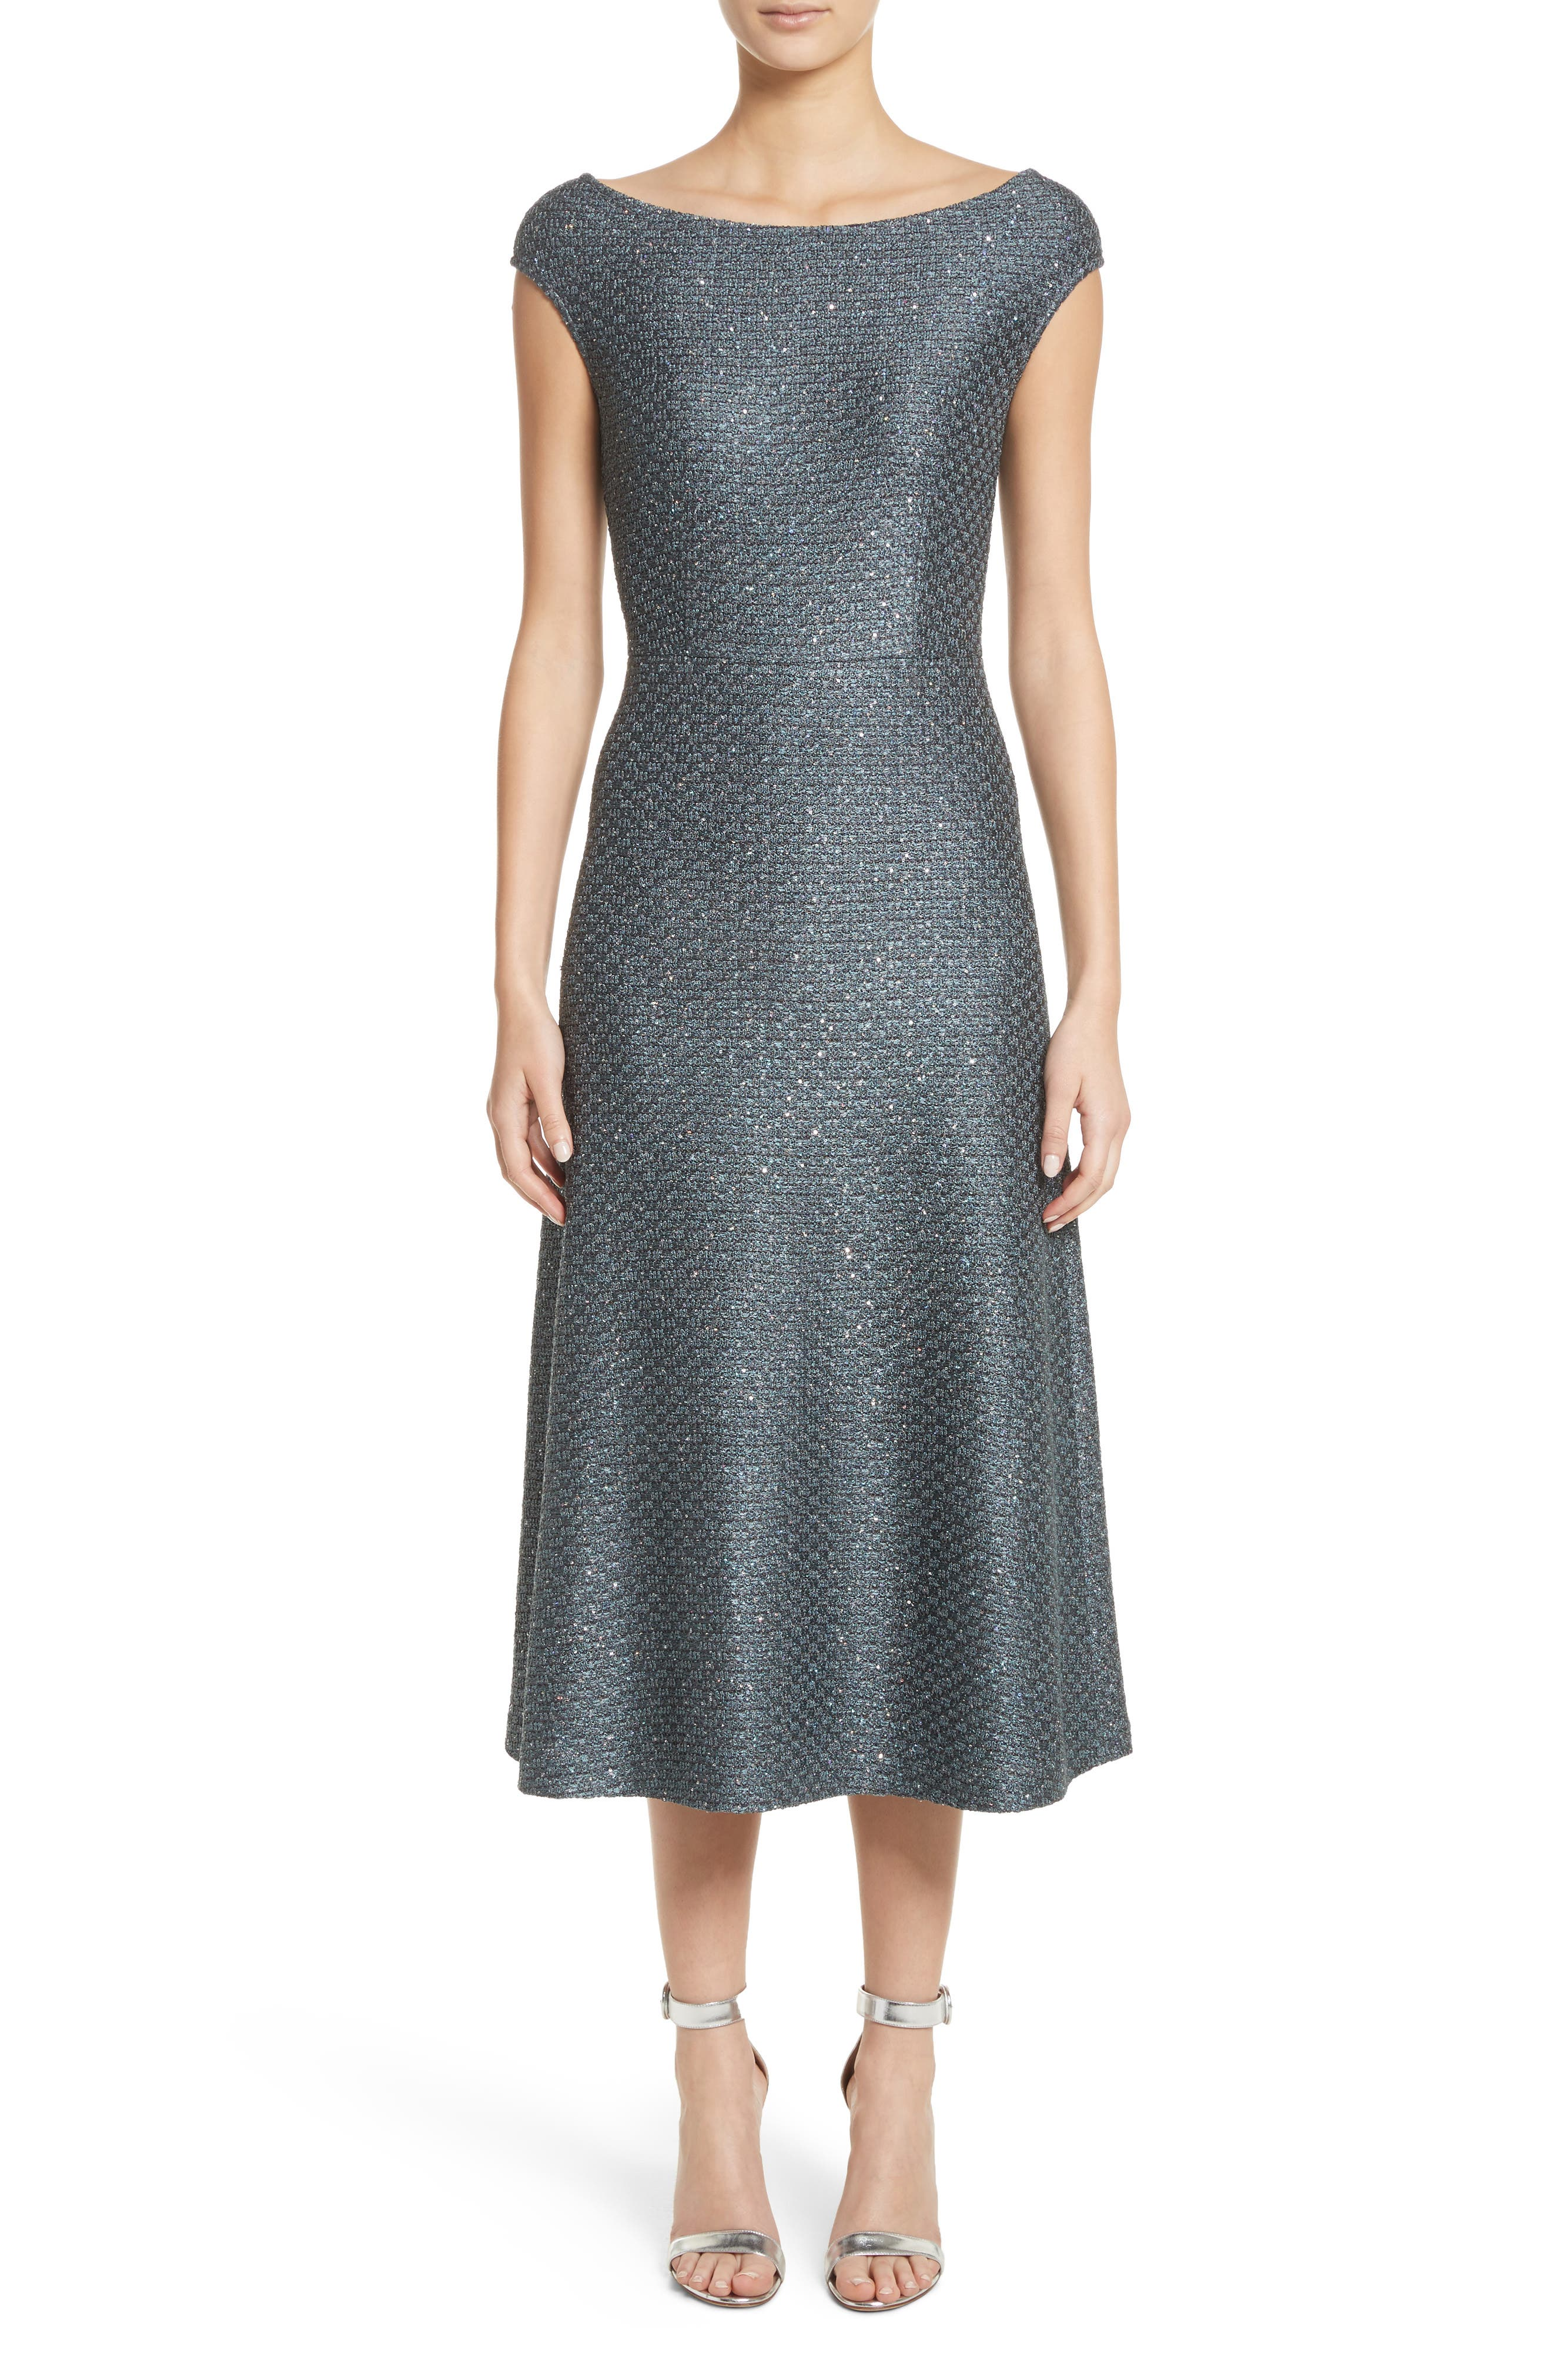 Sequin Knit Midi Dress,                         Main,                         color, Dark Grey Multi